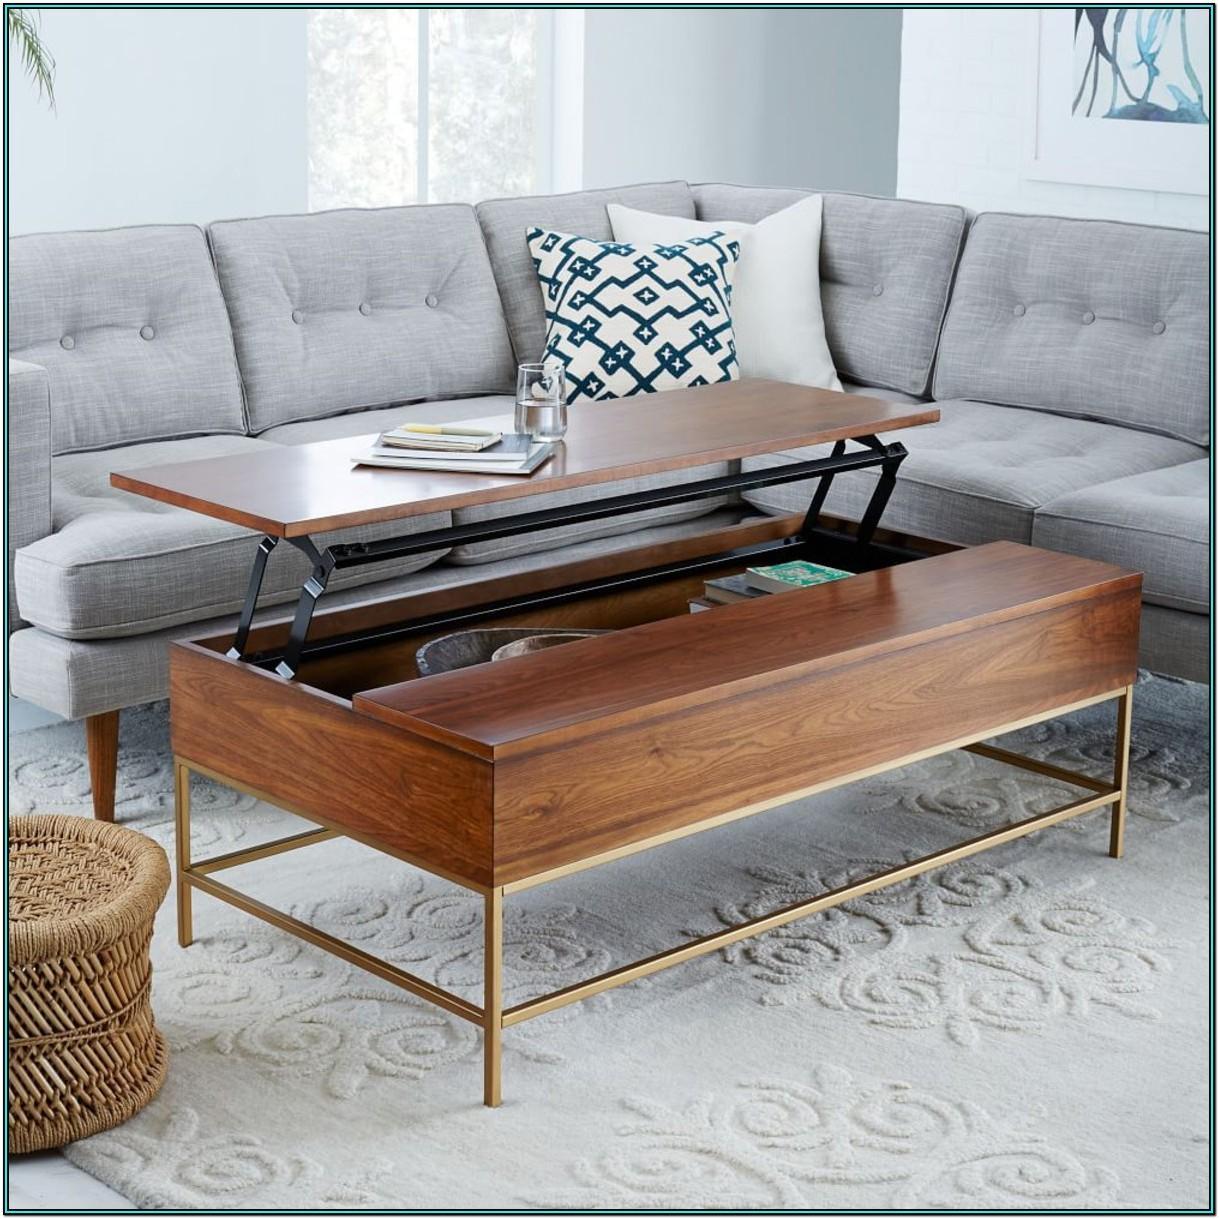 Big Coffee Table Small Living Room